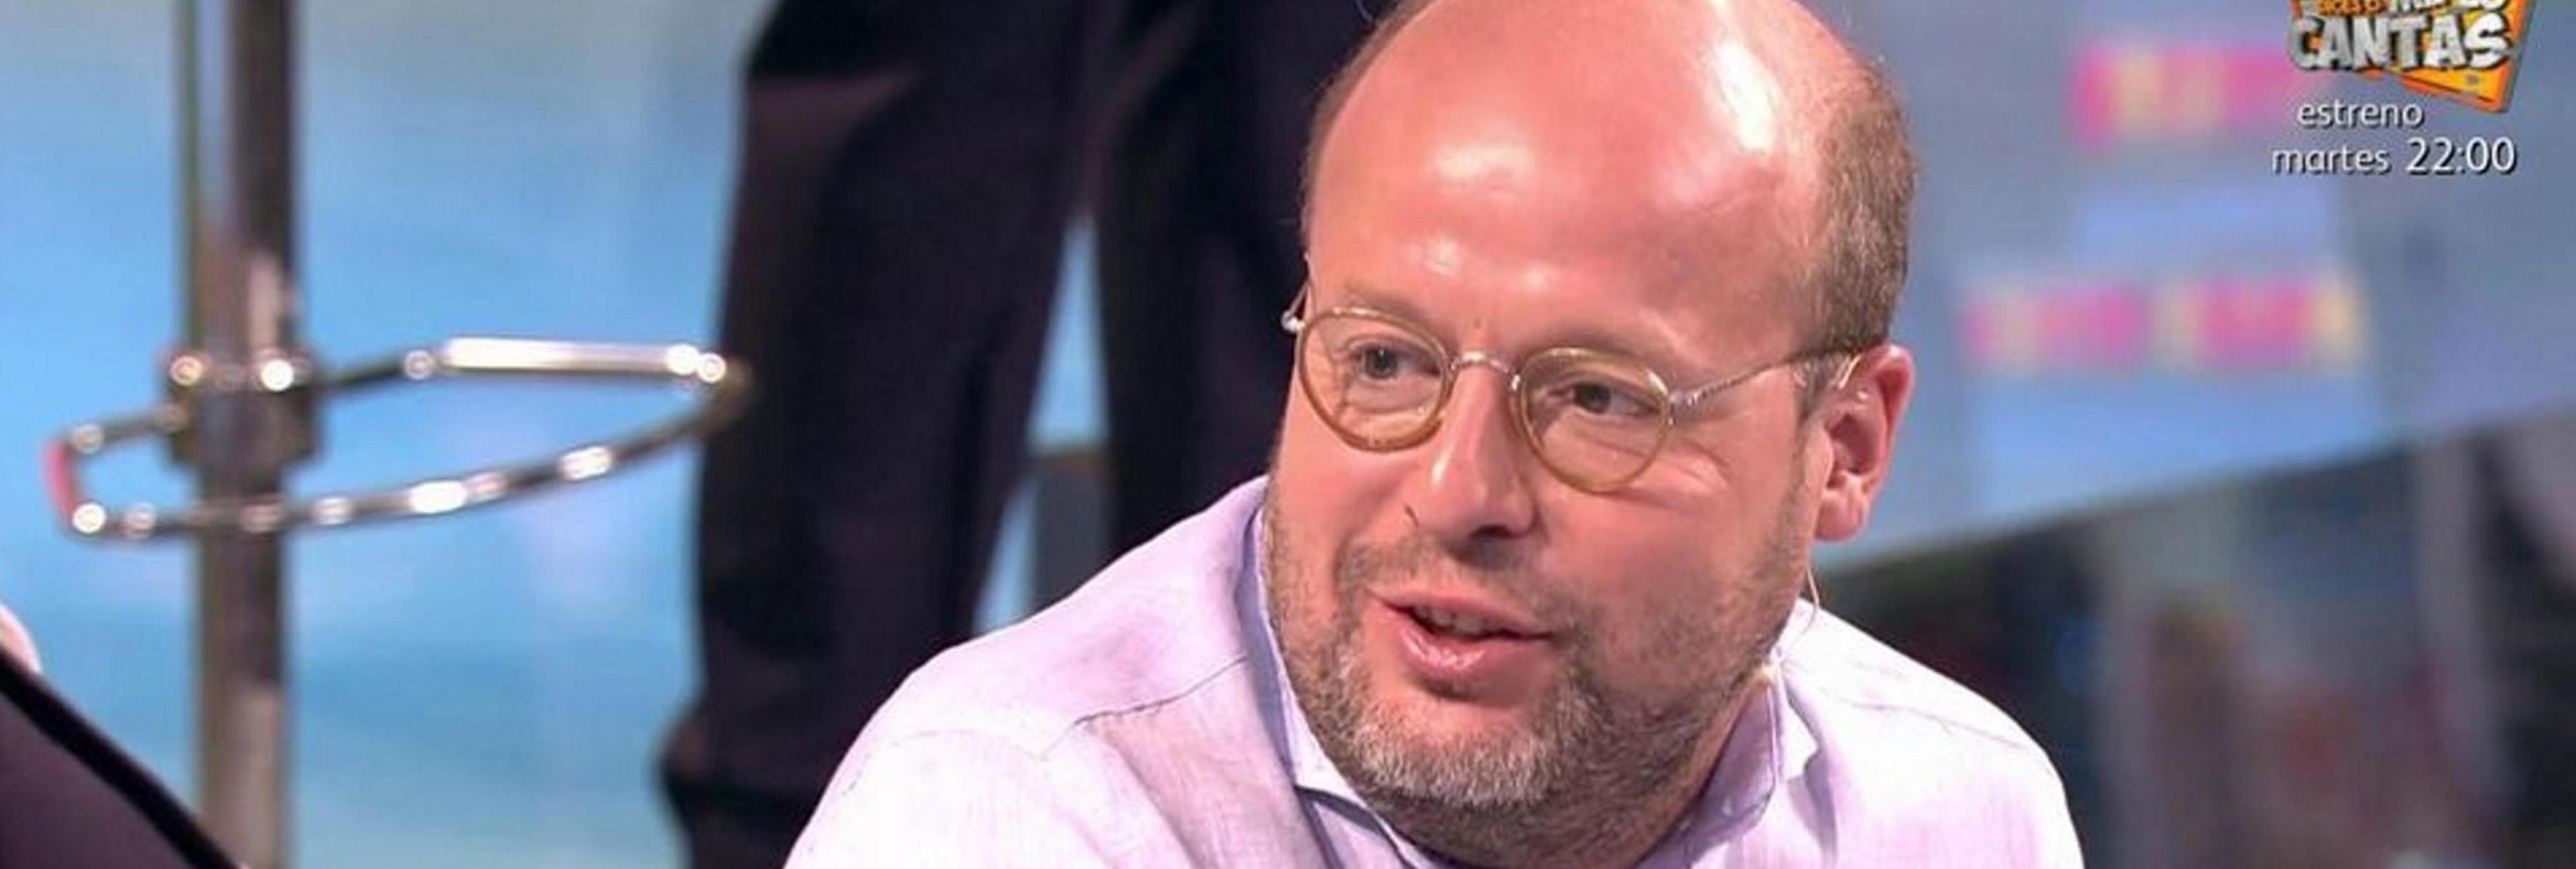 Campaña de recogida de firmas para que Salvador Sostres no vuelva a participar en TVE